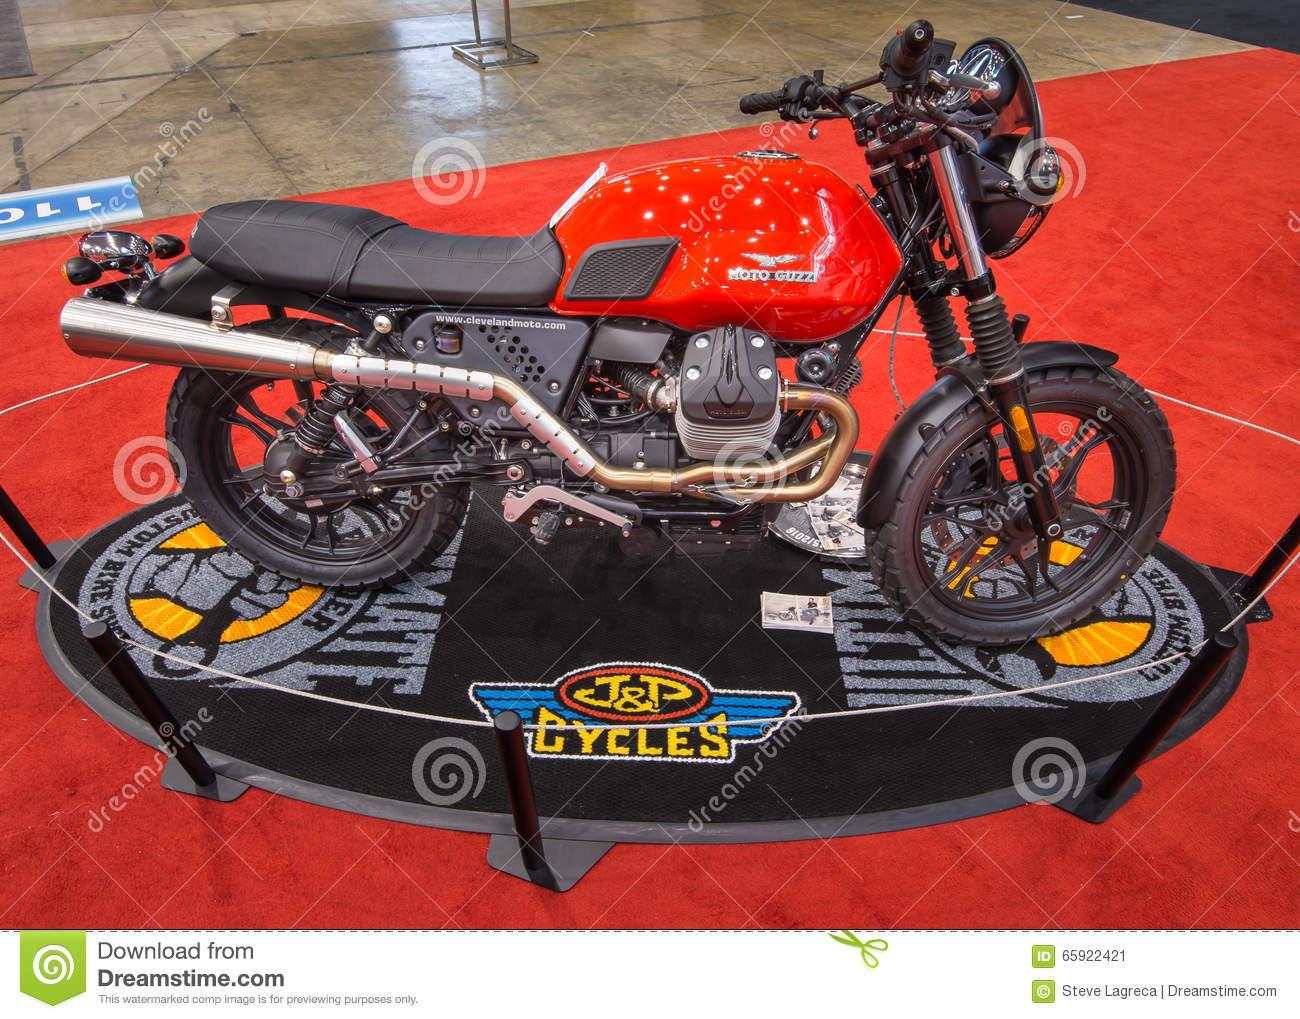 Customized Moto Guzzi V7 Scrambler Editorial Photo.